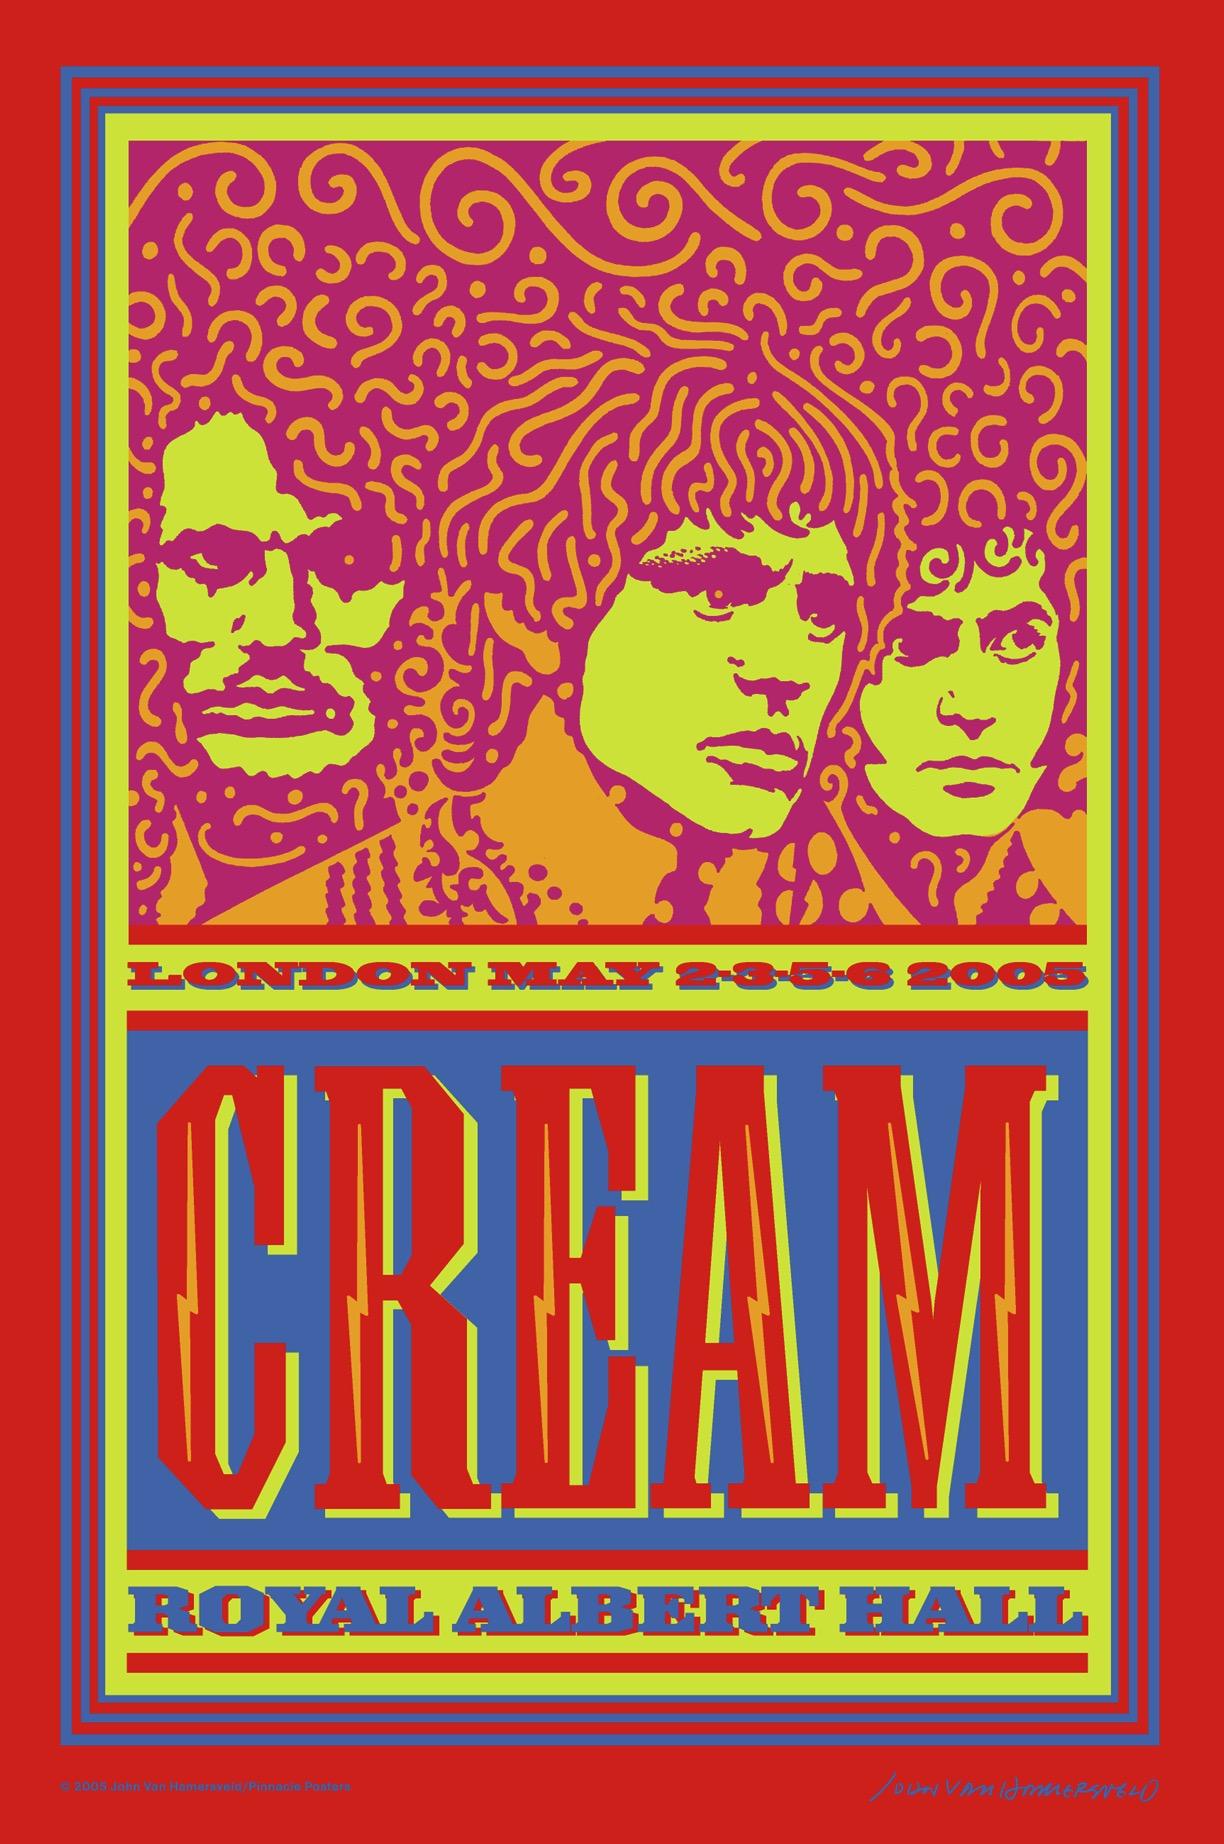 6-Cream POSTER_24_4_04_05 [Convert